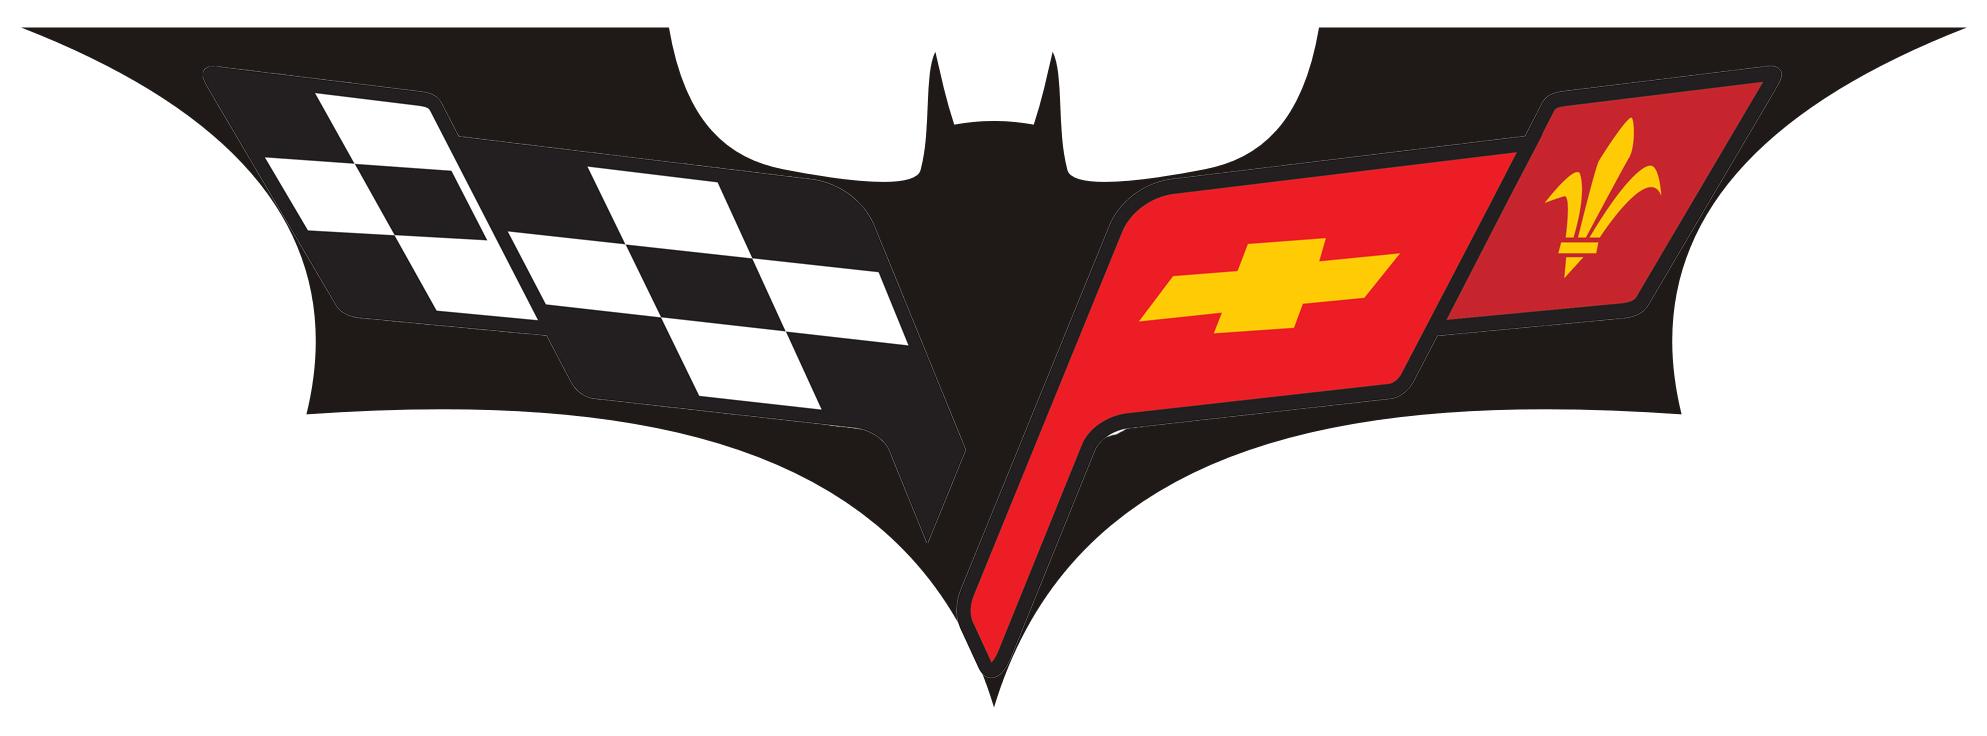 Corvette Logo 1987x736